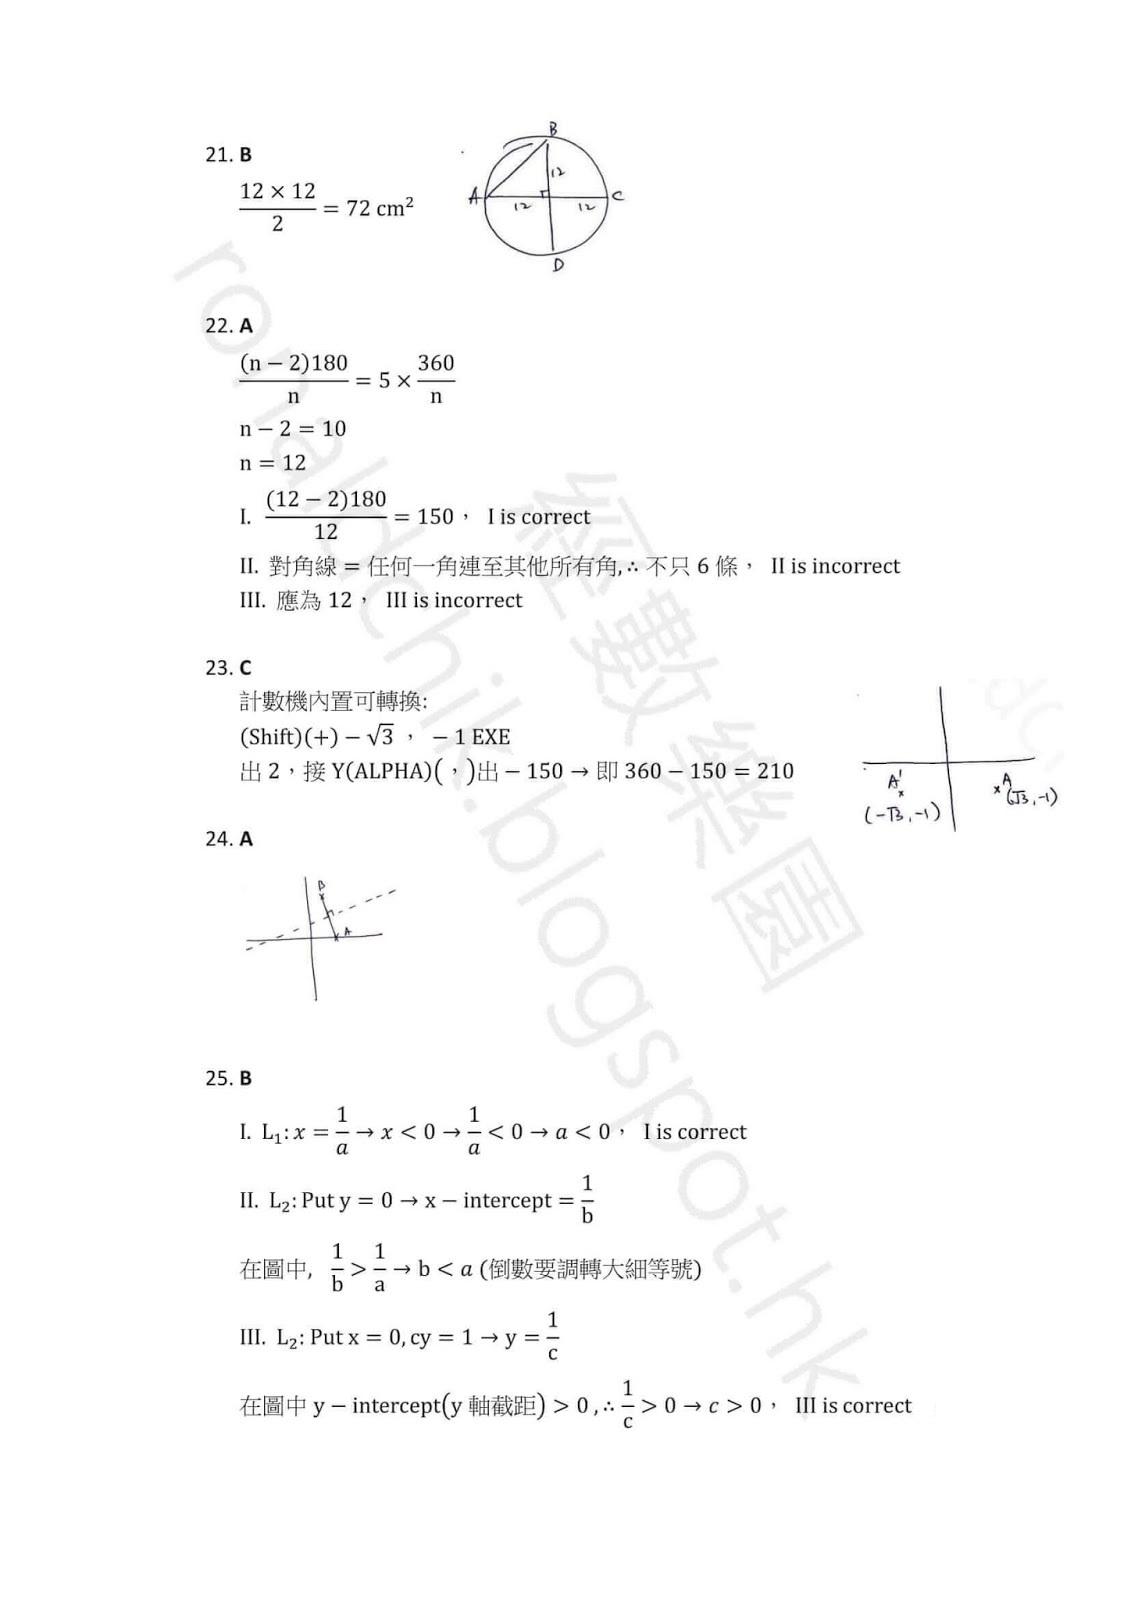 2015 DSE Math 數學 Paper 2 MC 卷二 答案 Q21,22,23,24,25